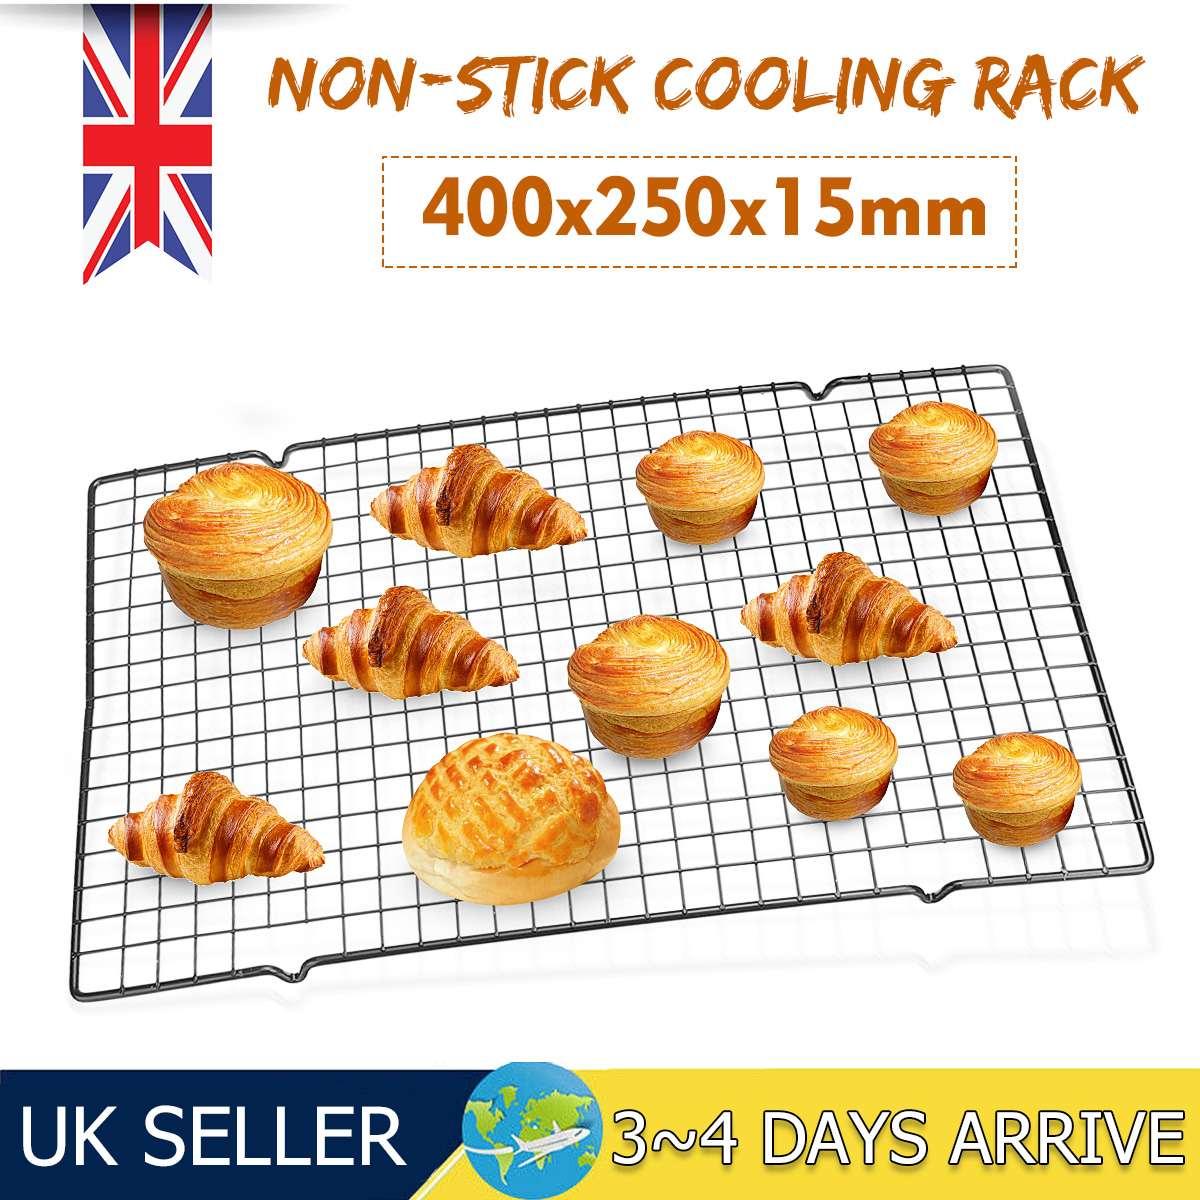 Rejilla de alambre de 400x250x15mm bandeja de enfriamiento estante para pastel estante para comida horno cocina hornear Pizza pan barbacoa galleta soporte estante